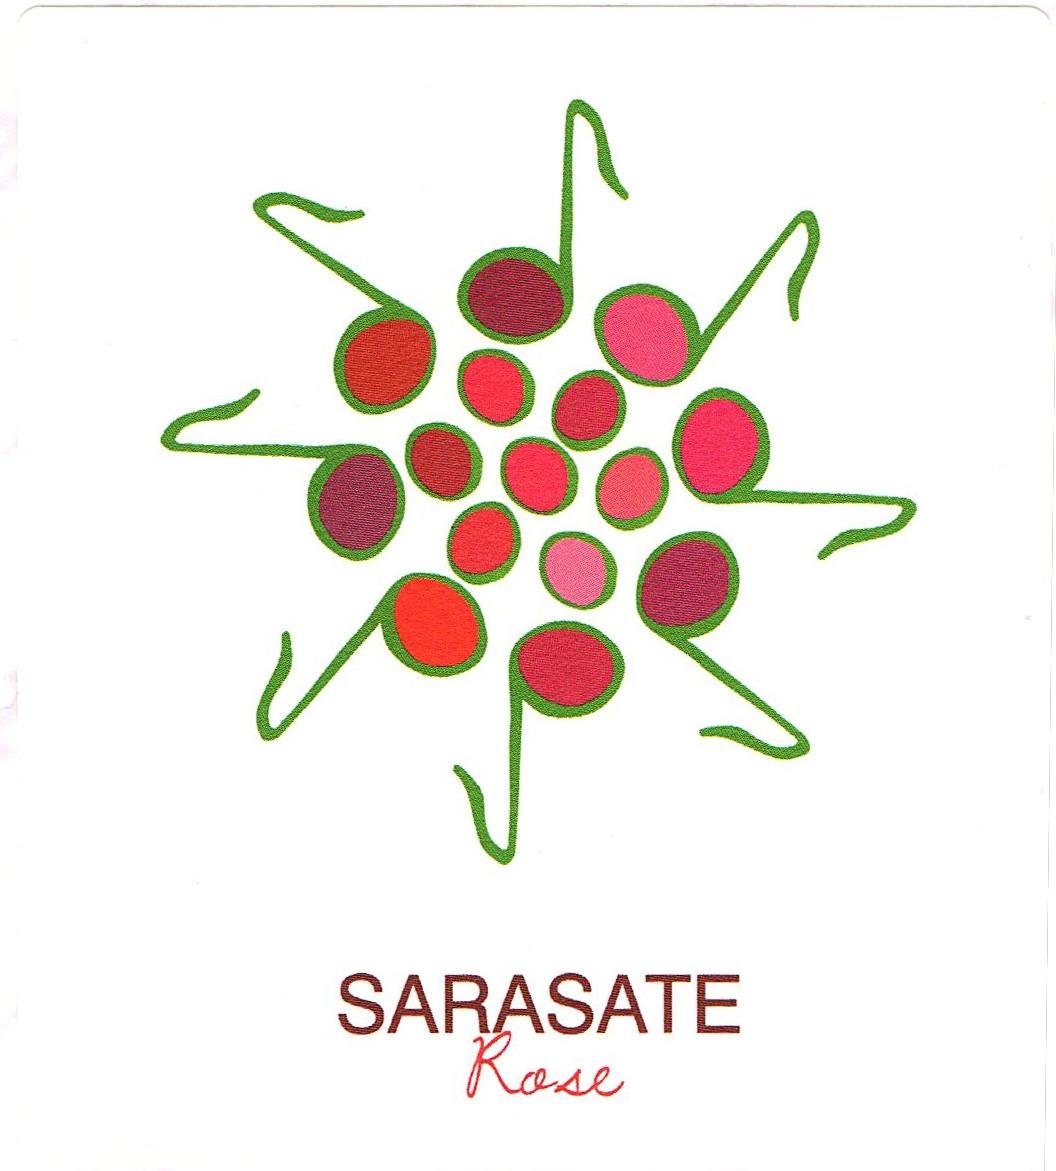 Sarasate Rose